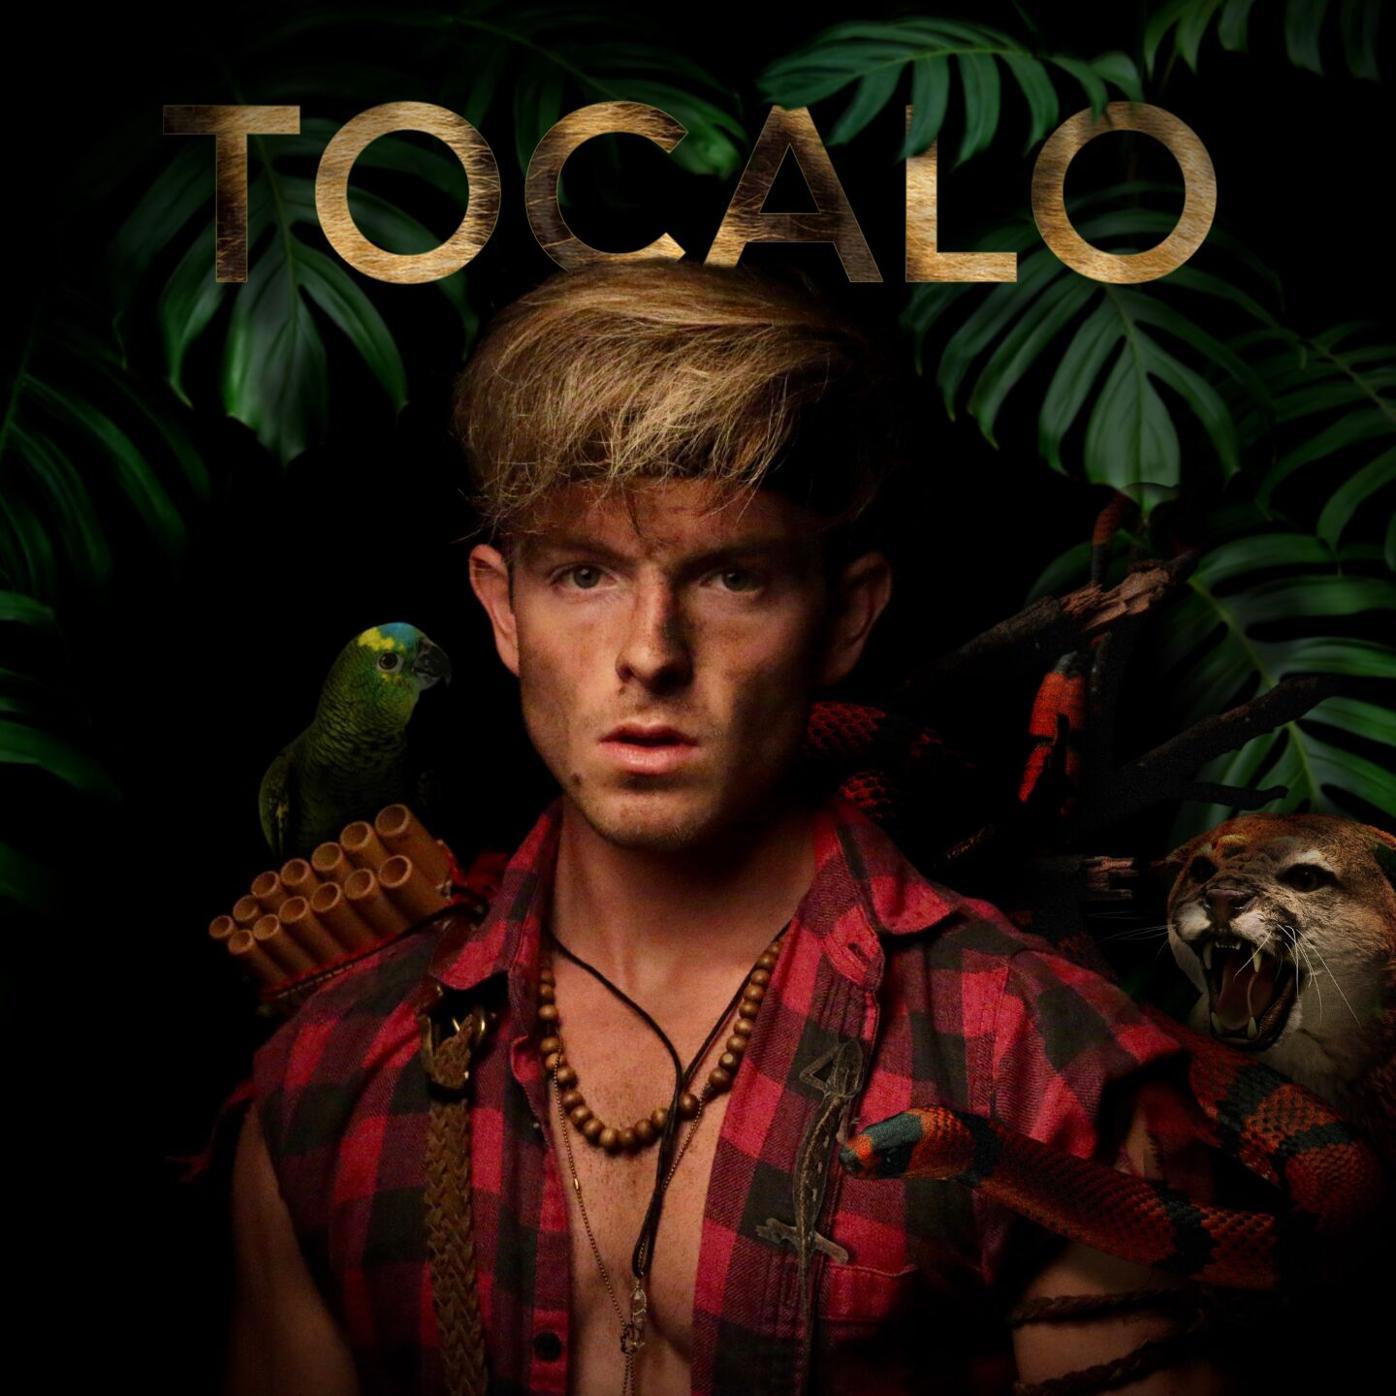 Tocalo Album Cover